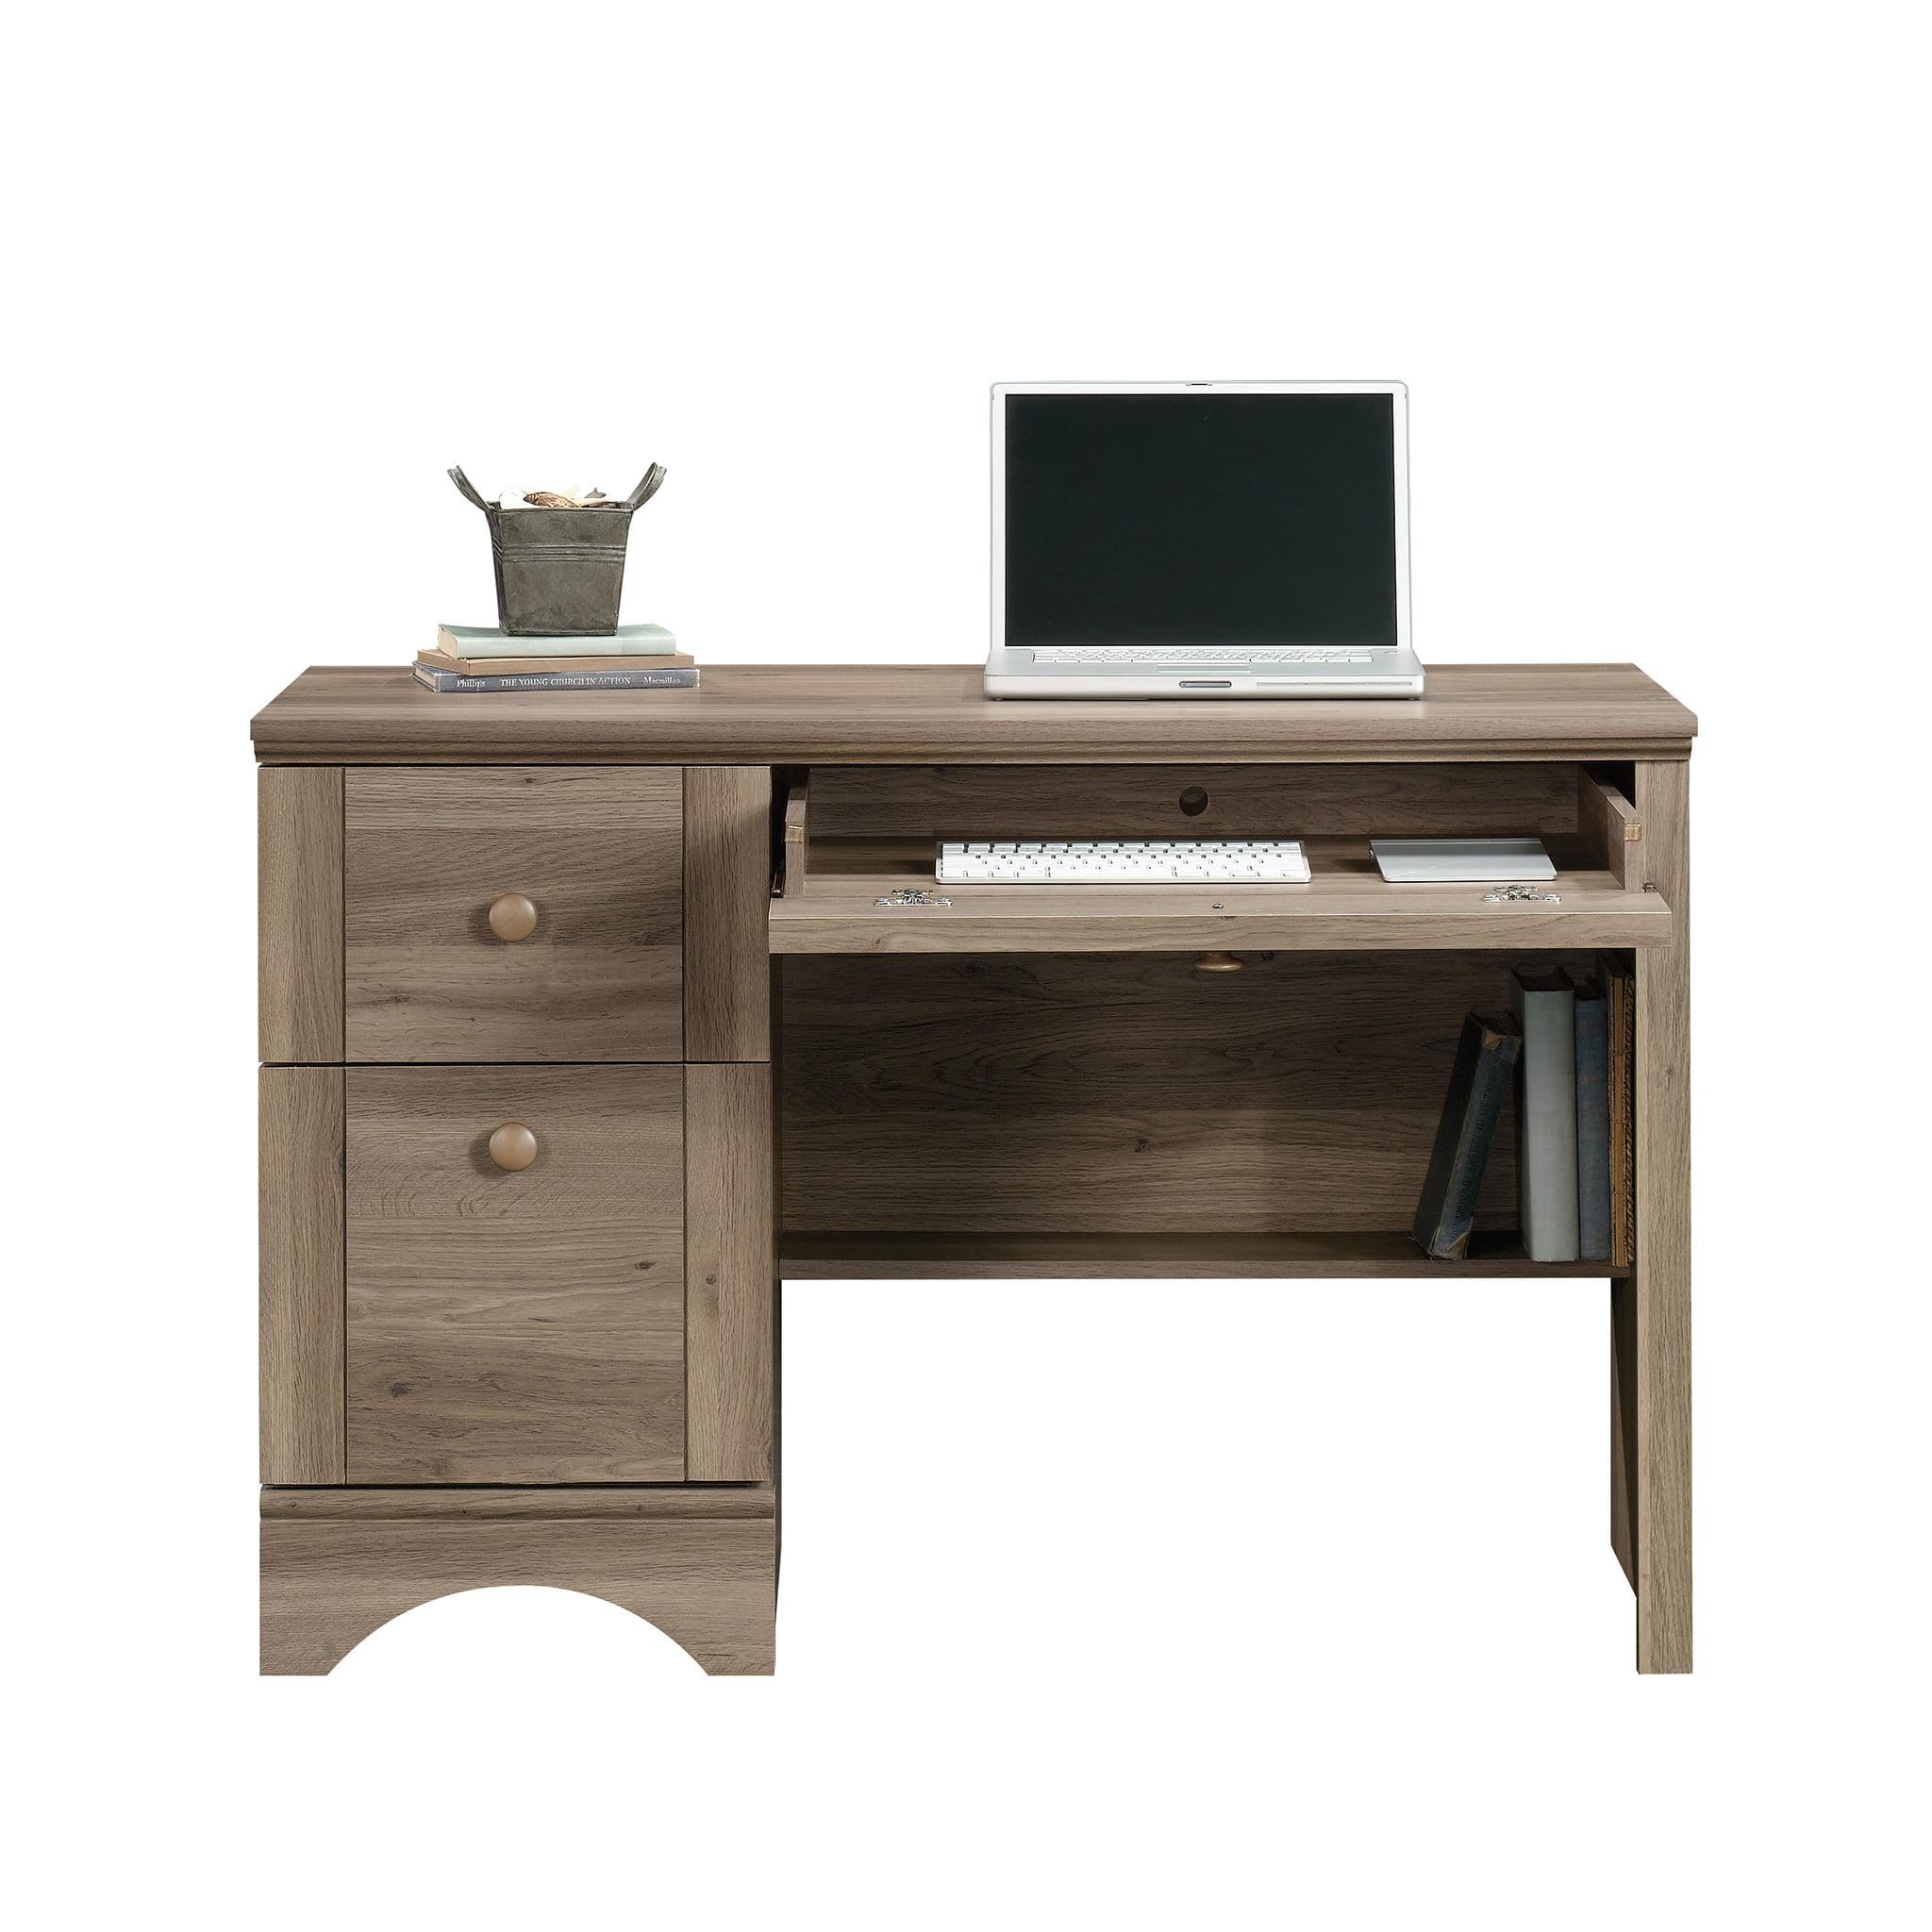 Sauder Harbor View Computer Desk, Salt Oak Finish